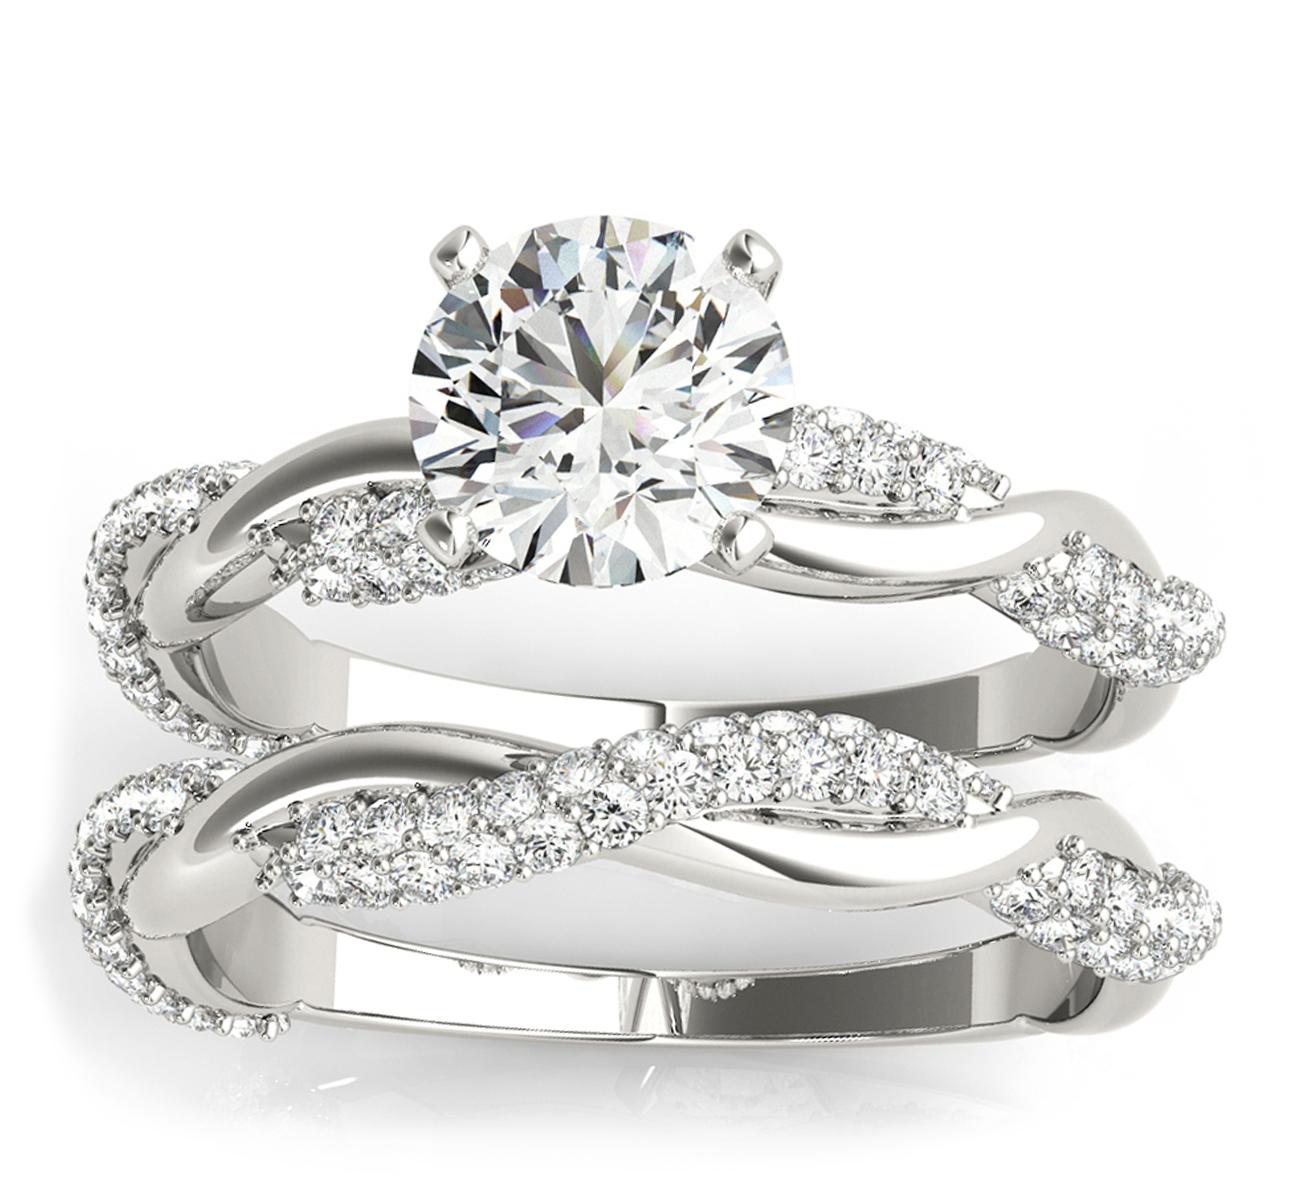 Infinity Twist Diamond Bridal Ring Set Setting 14k White Gold (0.80 ct)